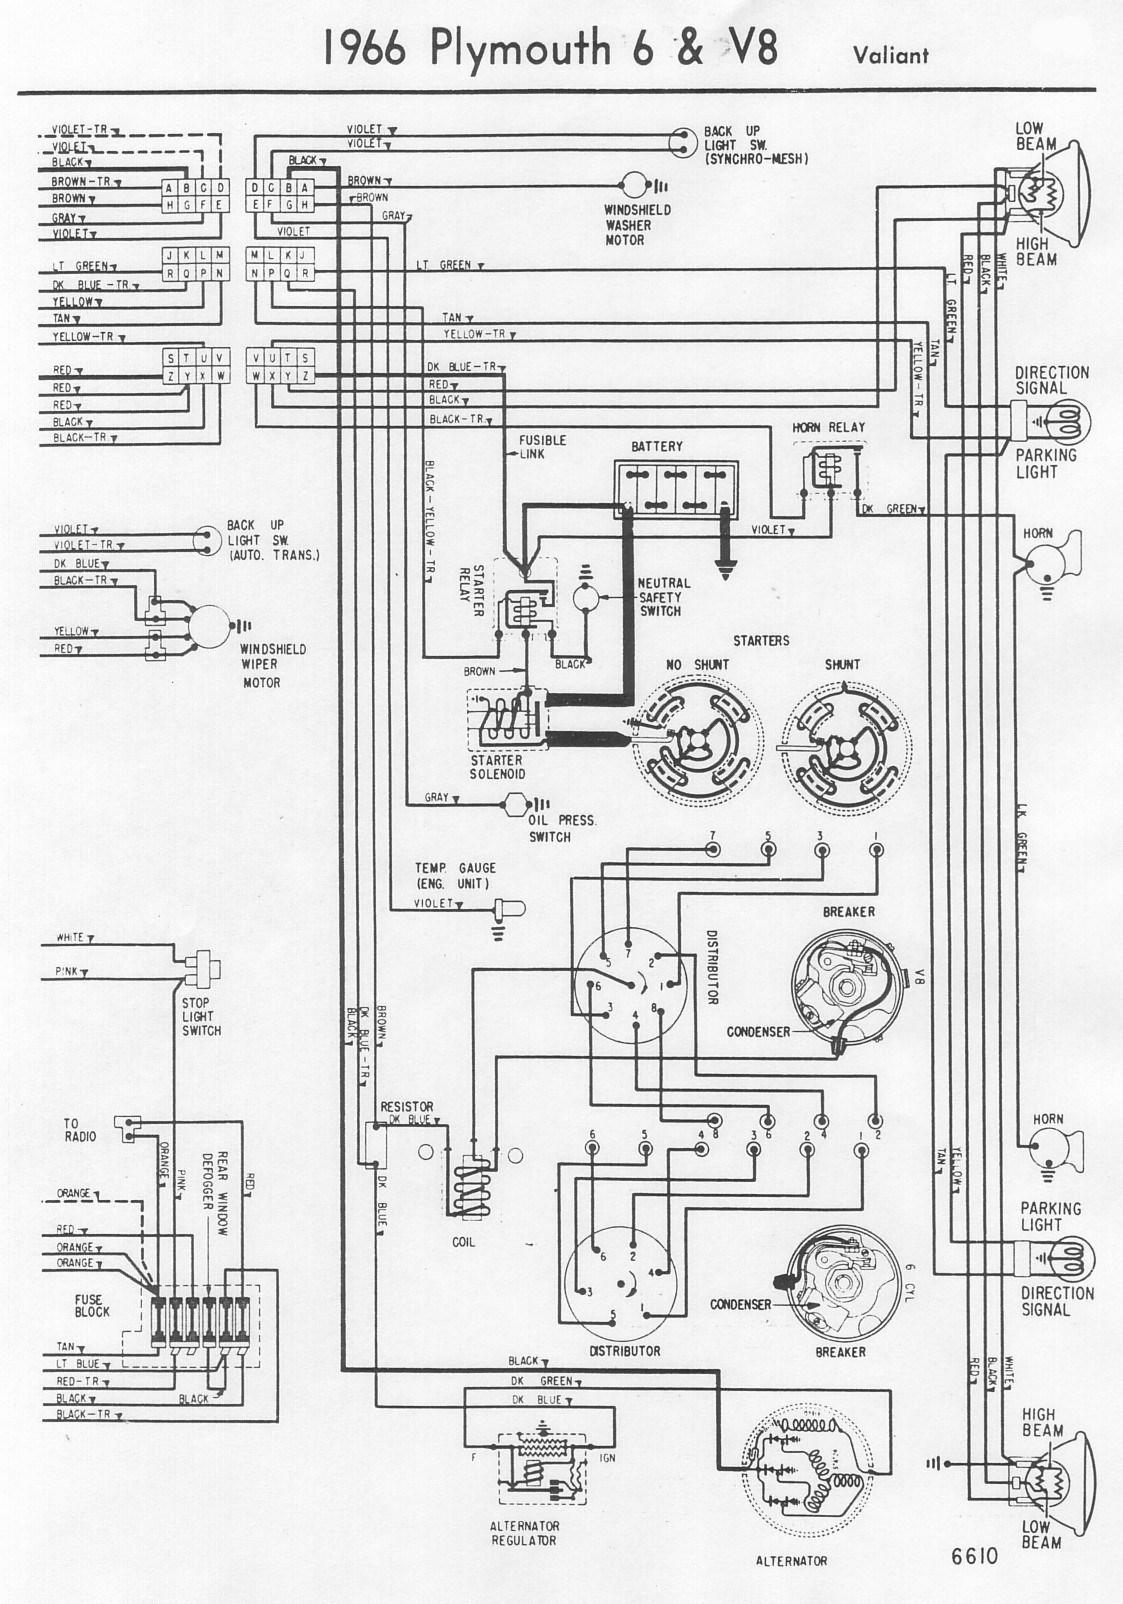 06 400ex Wiring Diagram 9 Lead 3 Phase Motor Wiring Diagram Bullet Squier Nescafe Jeanjaures37 Fr